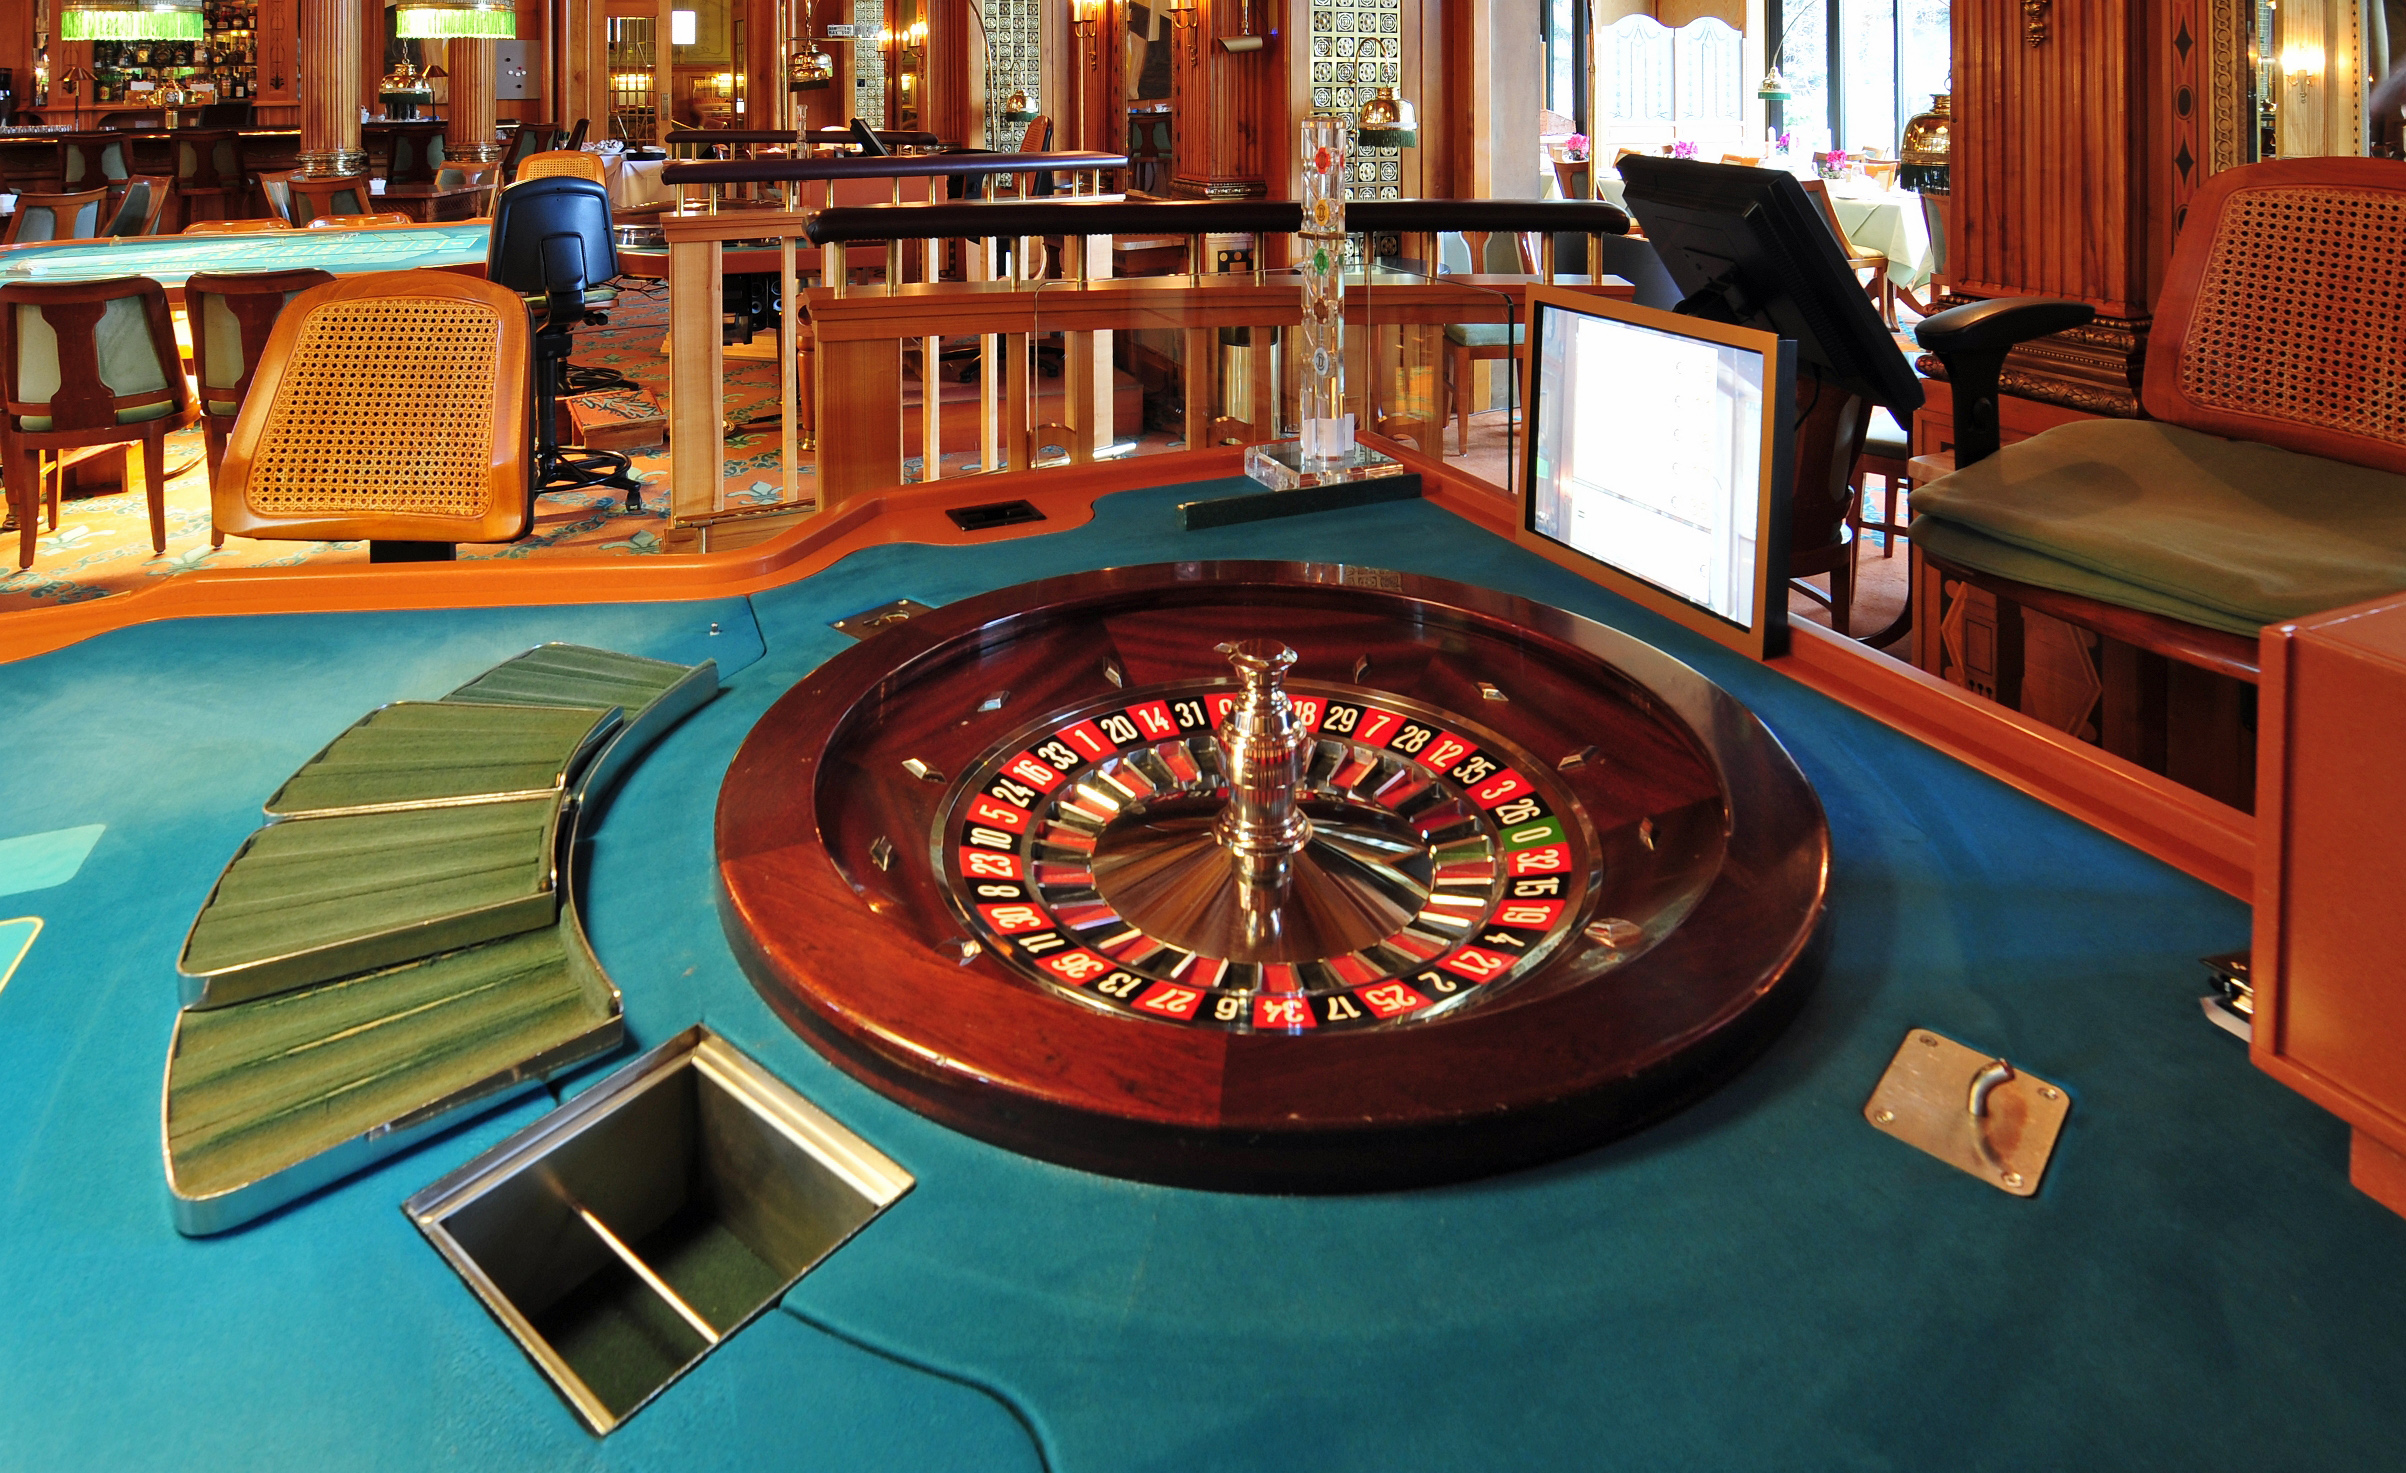 Europäischer Roulette Kessel Casino Wiesbaden